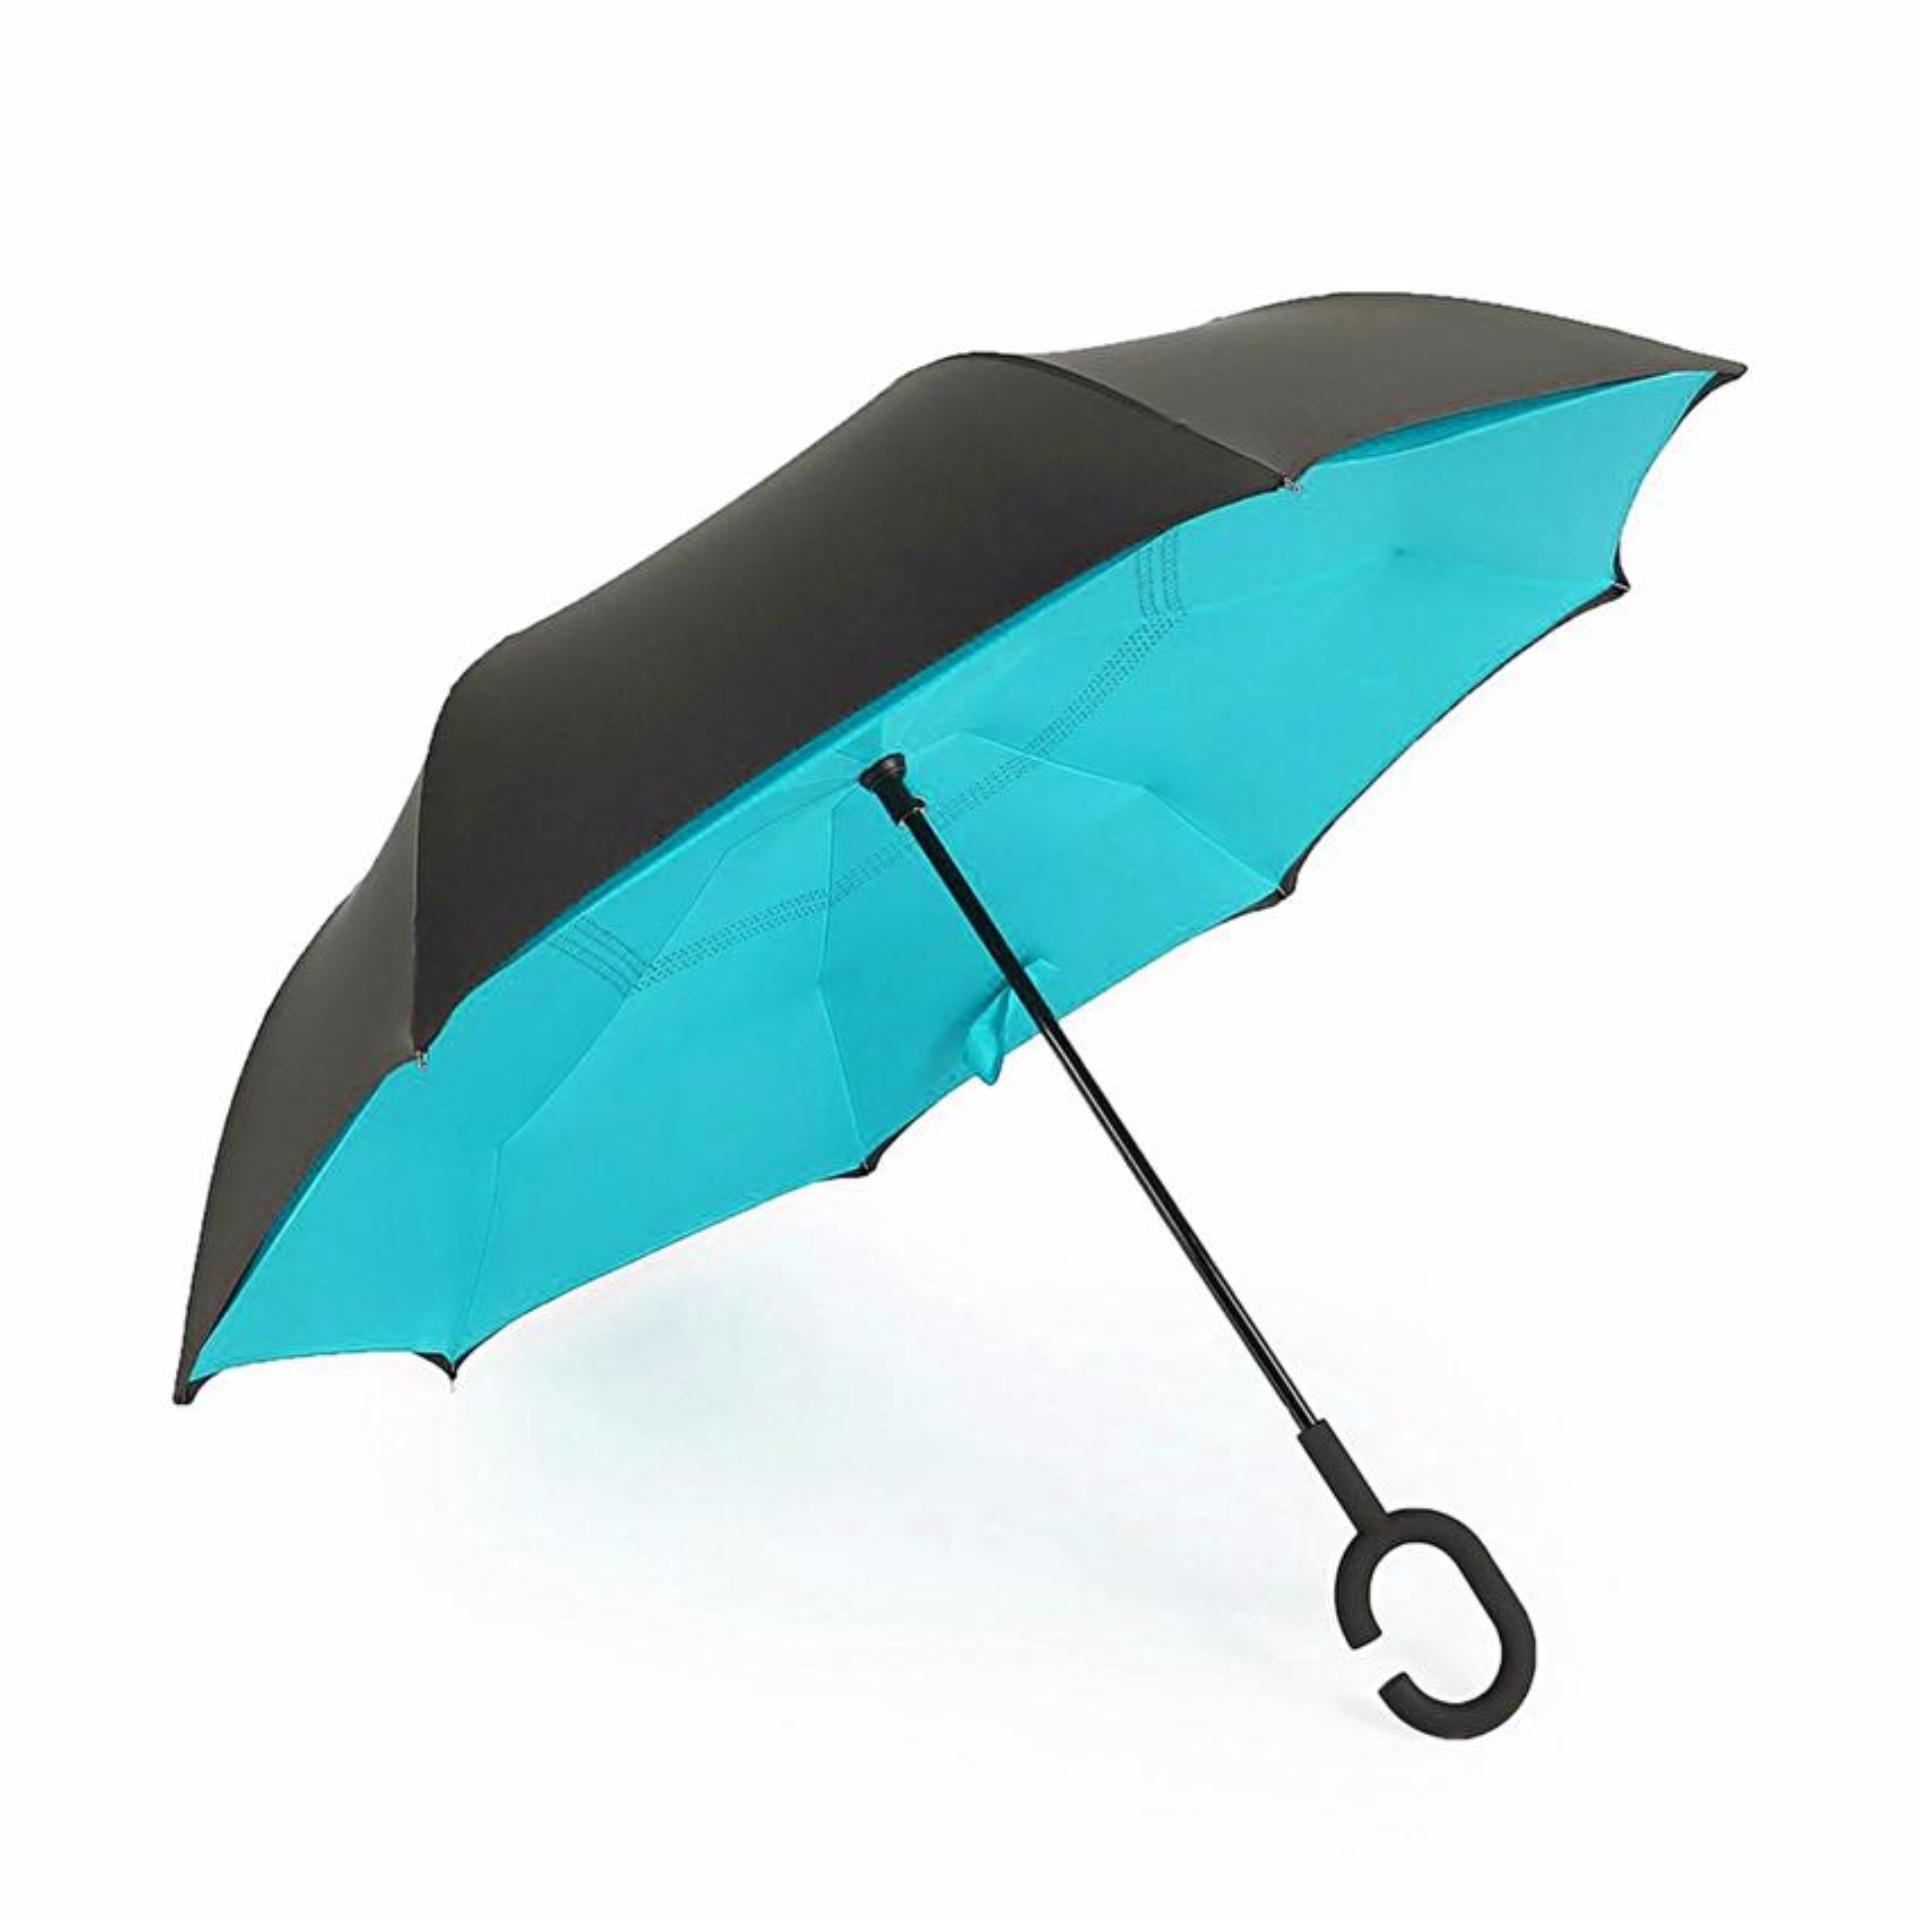 ... Kazbrella Payung Terbalik / Reverse Umbrella Gagang C - TOSCA ...